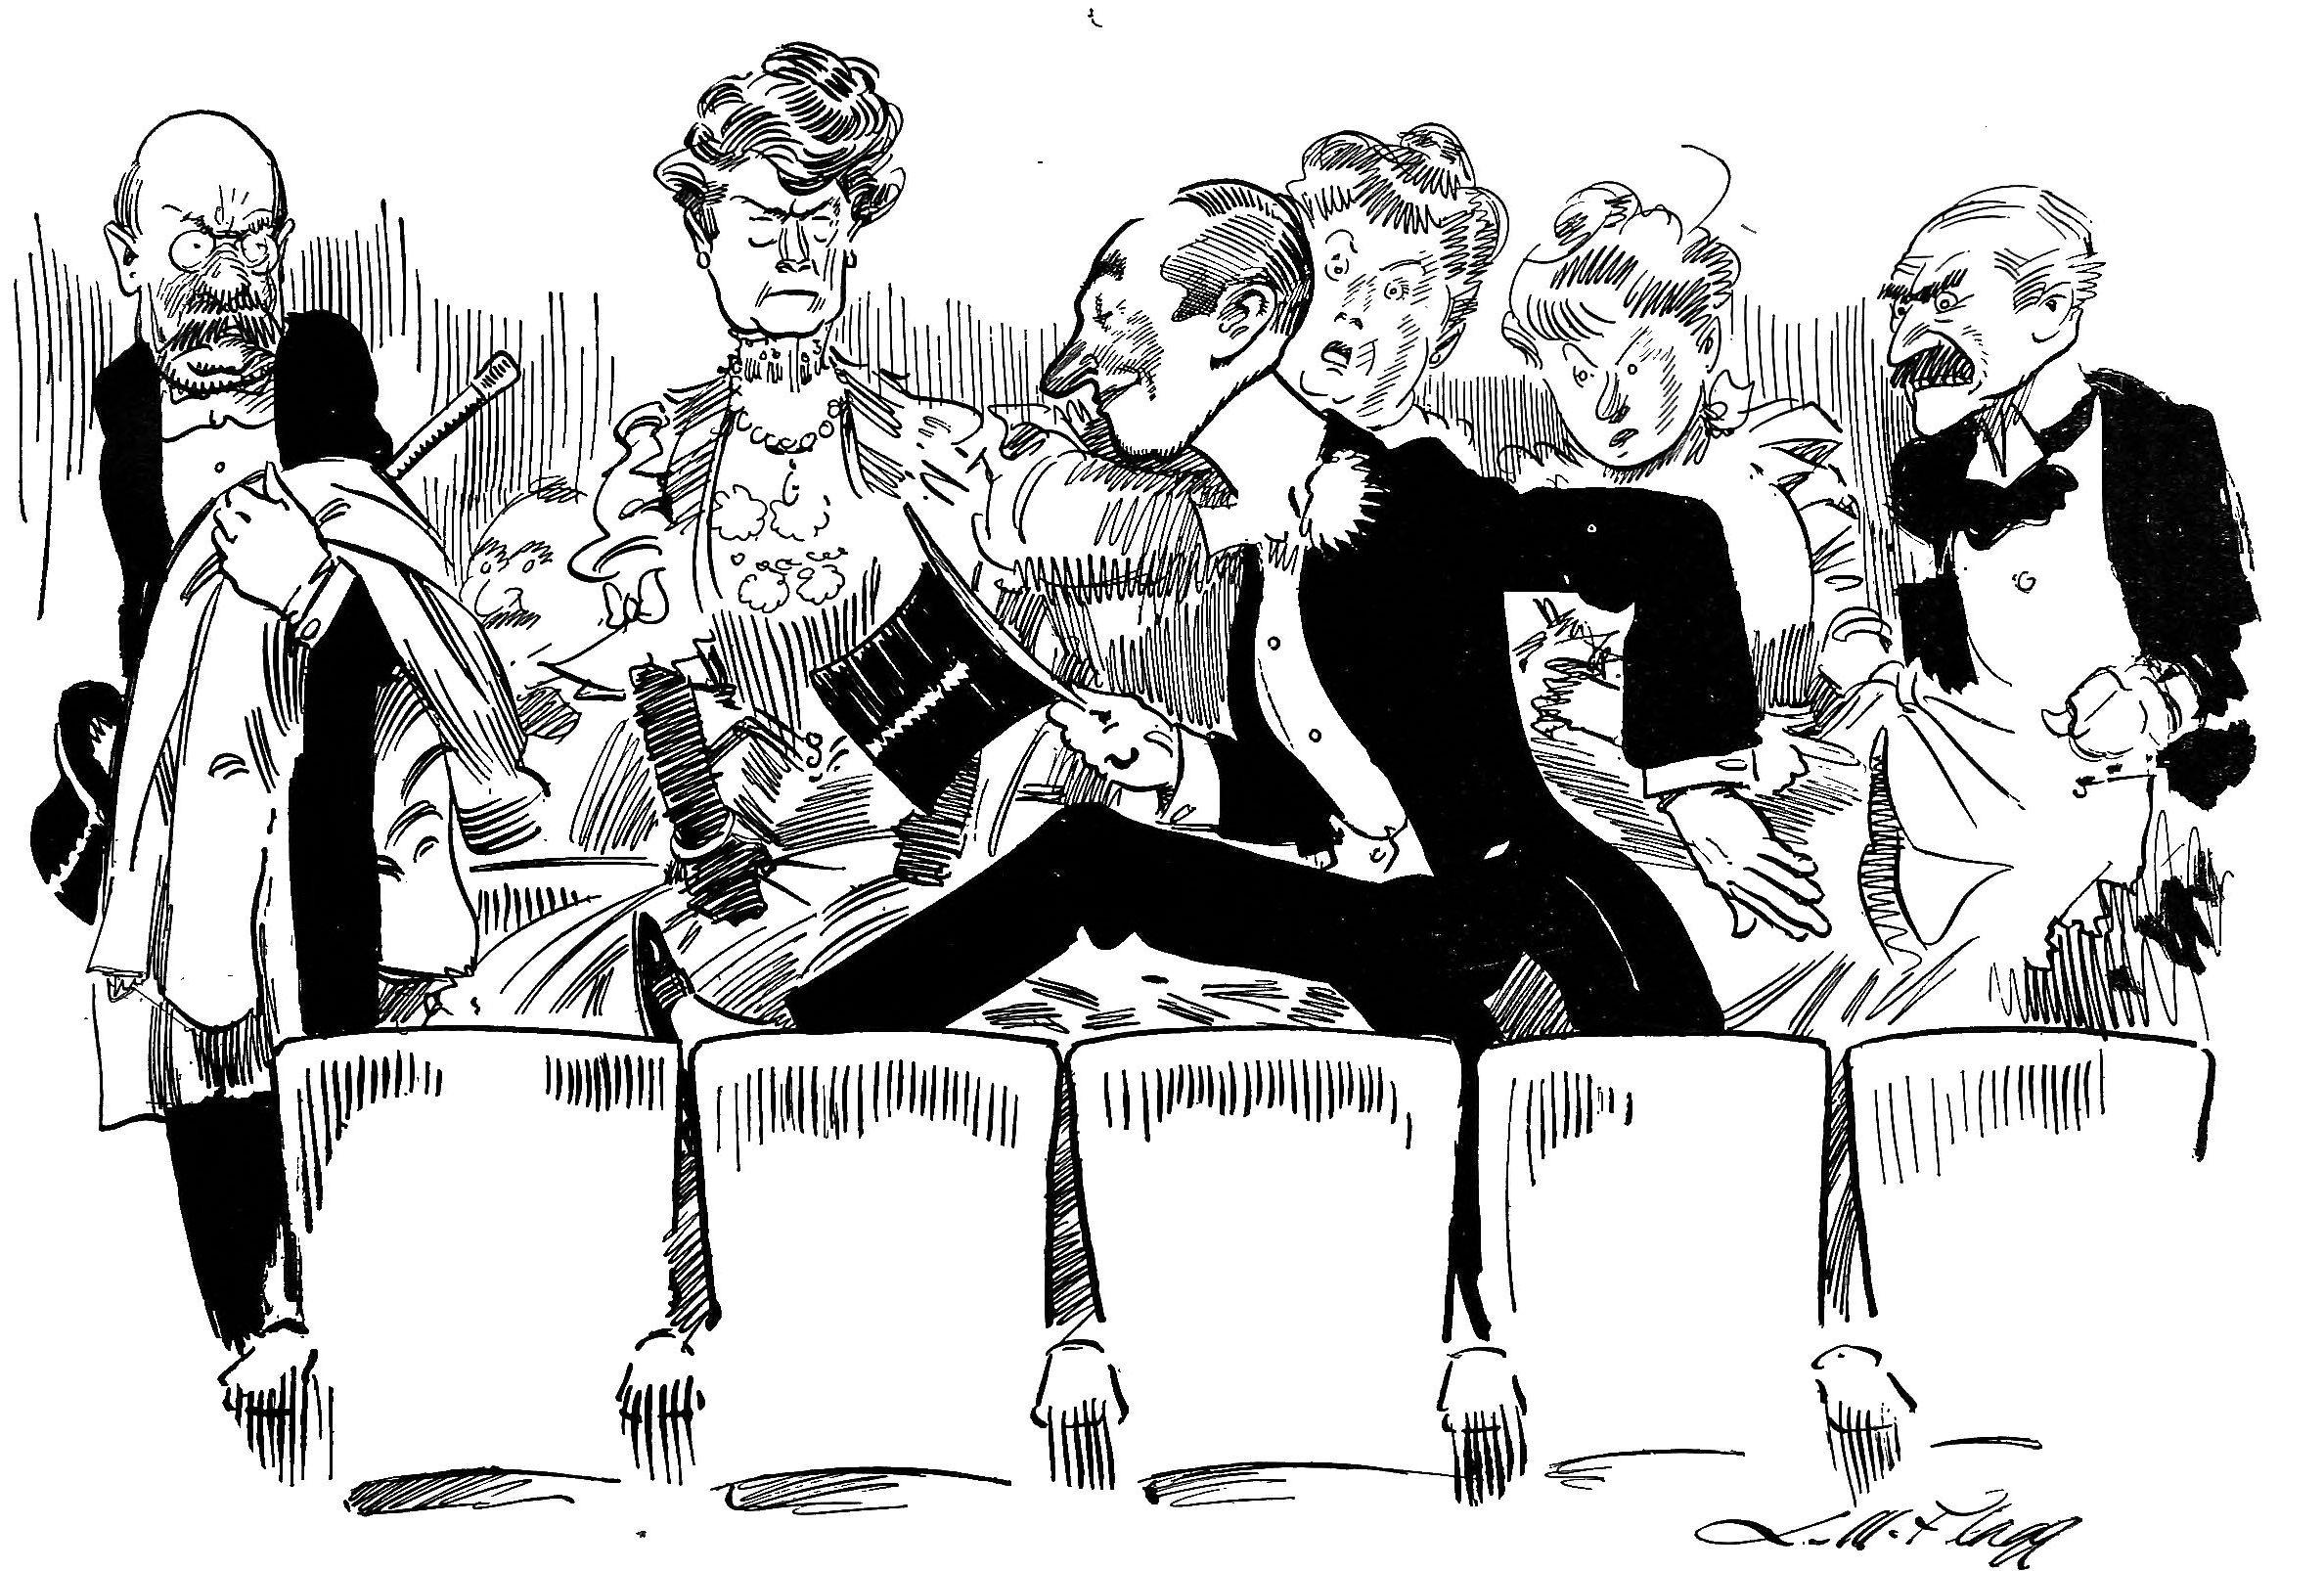 caricature- image_164-crop